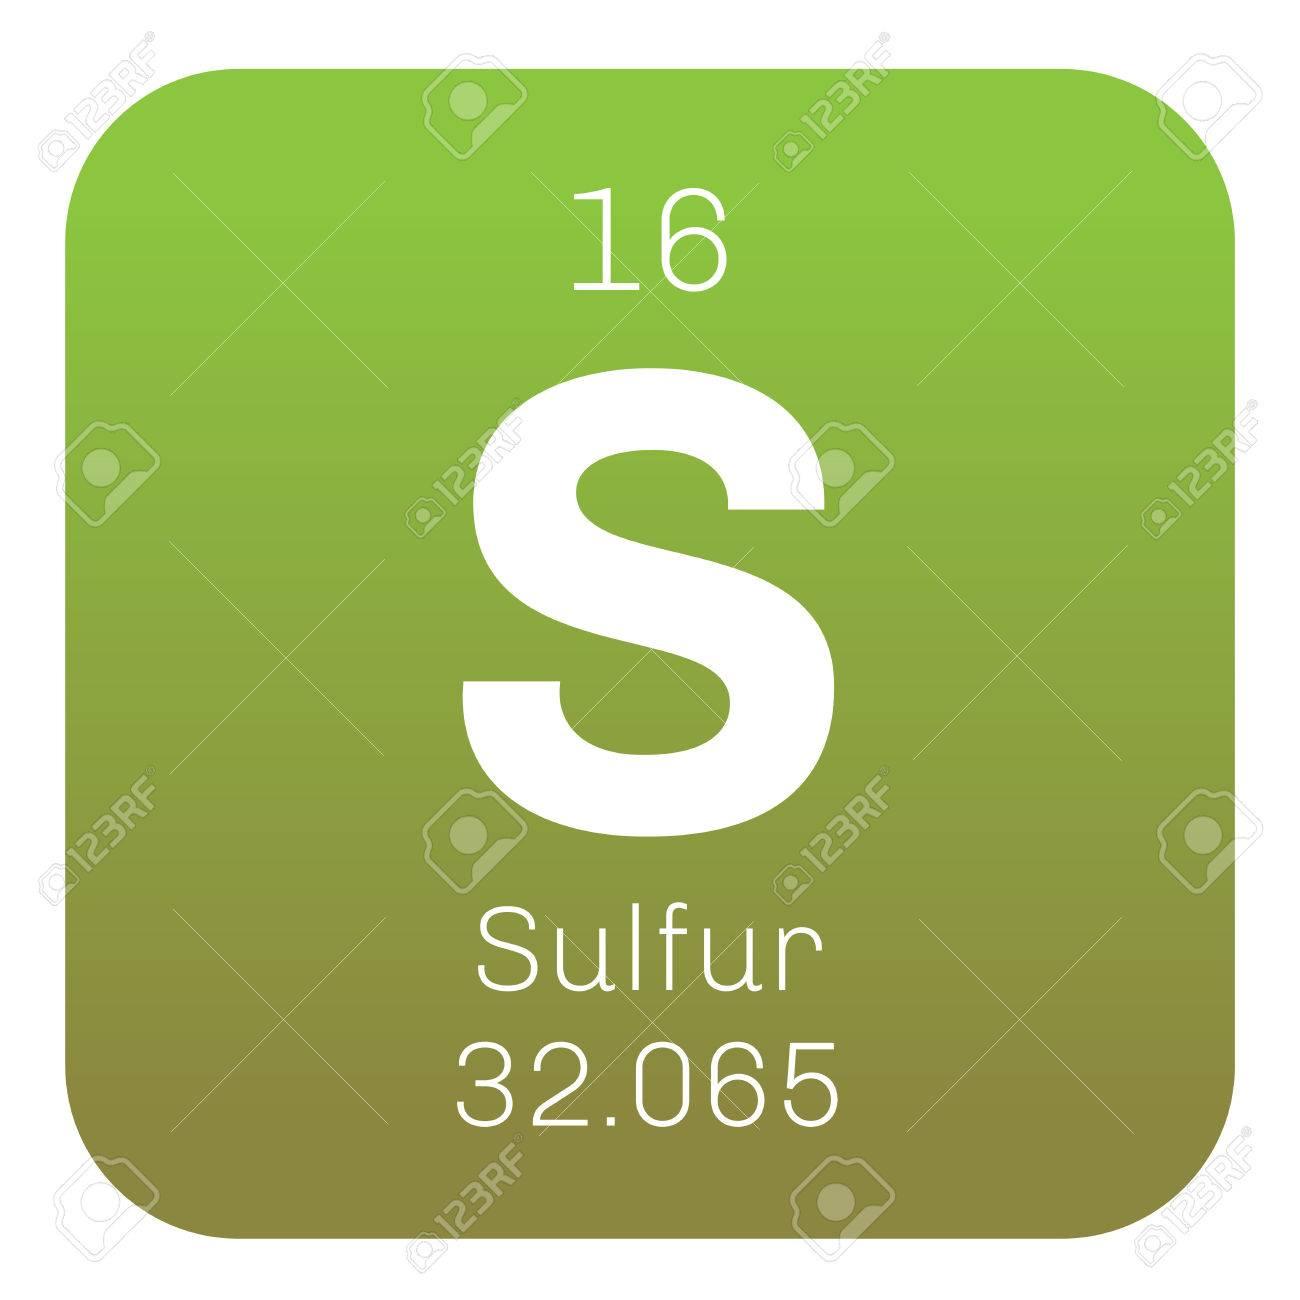 Sulfur chemical element abundant non metal element colored sulfur chemical element abundant non metal element colored icon with atomic number and buycottarizona Image collections